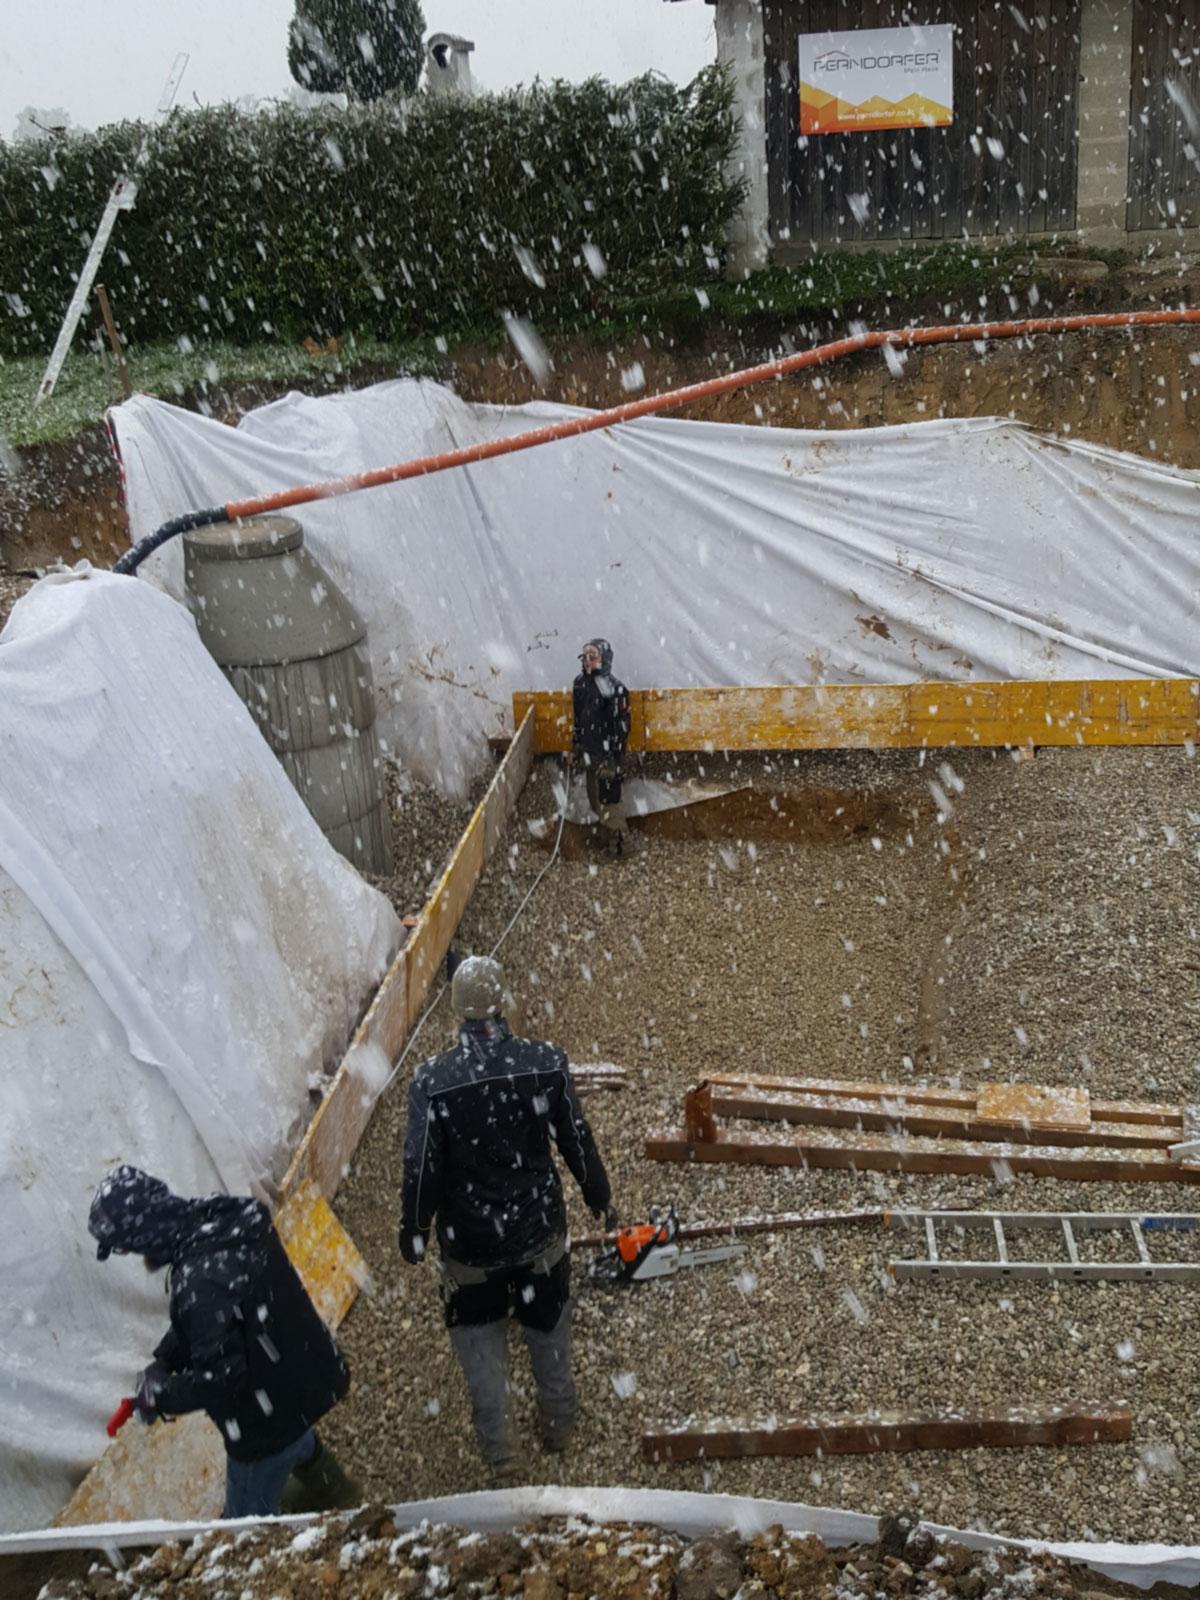 Baustelle im Winter II